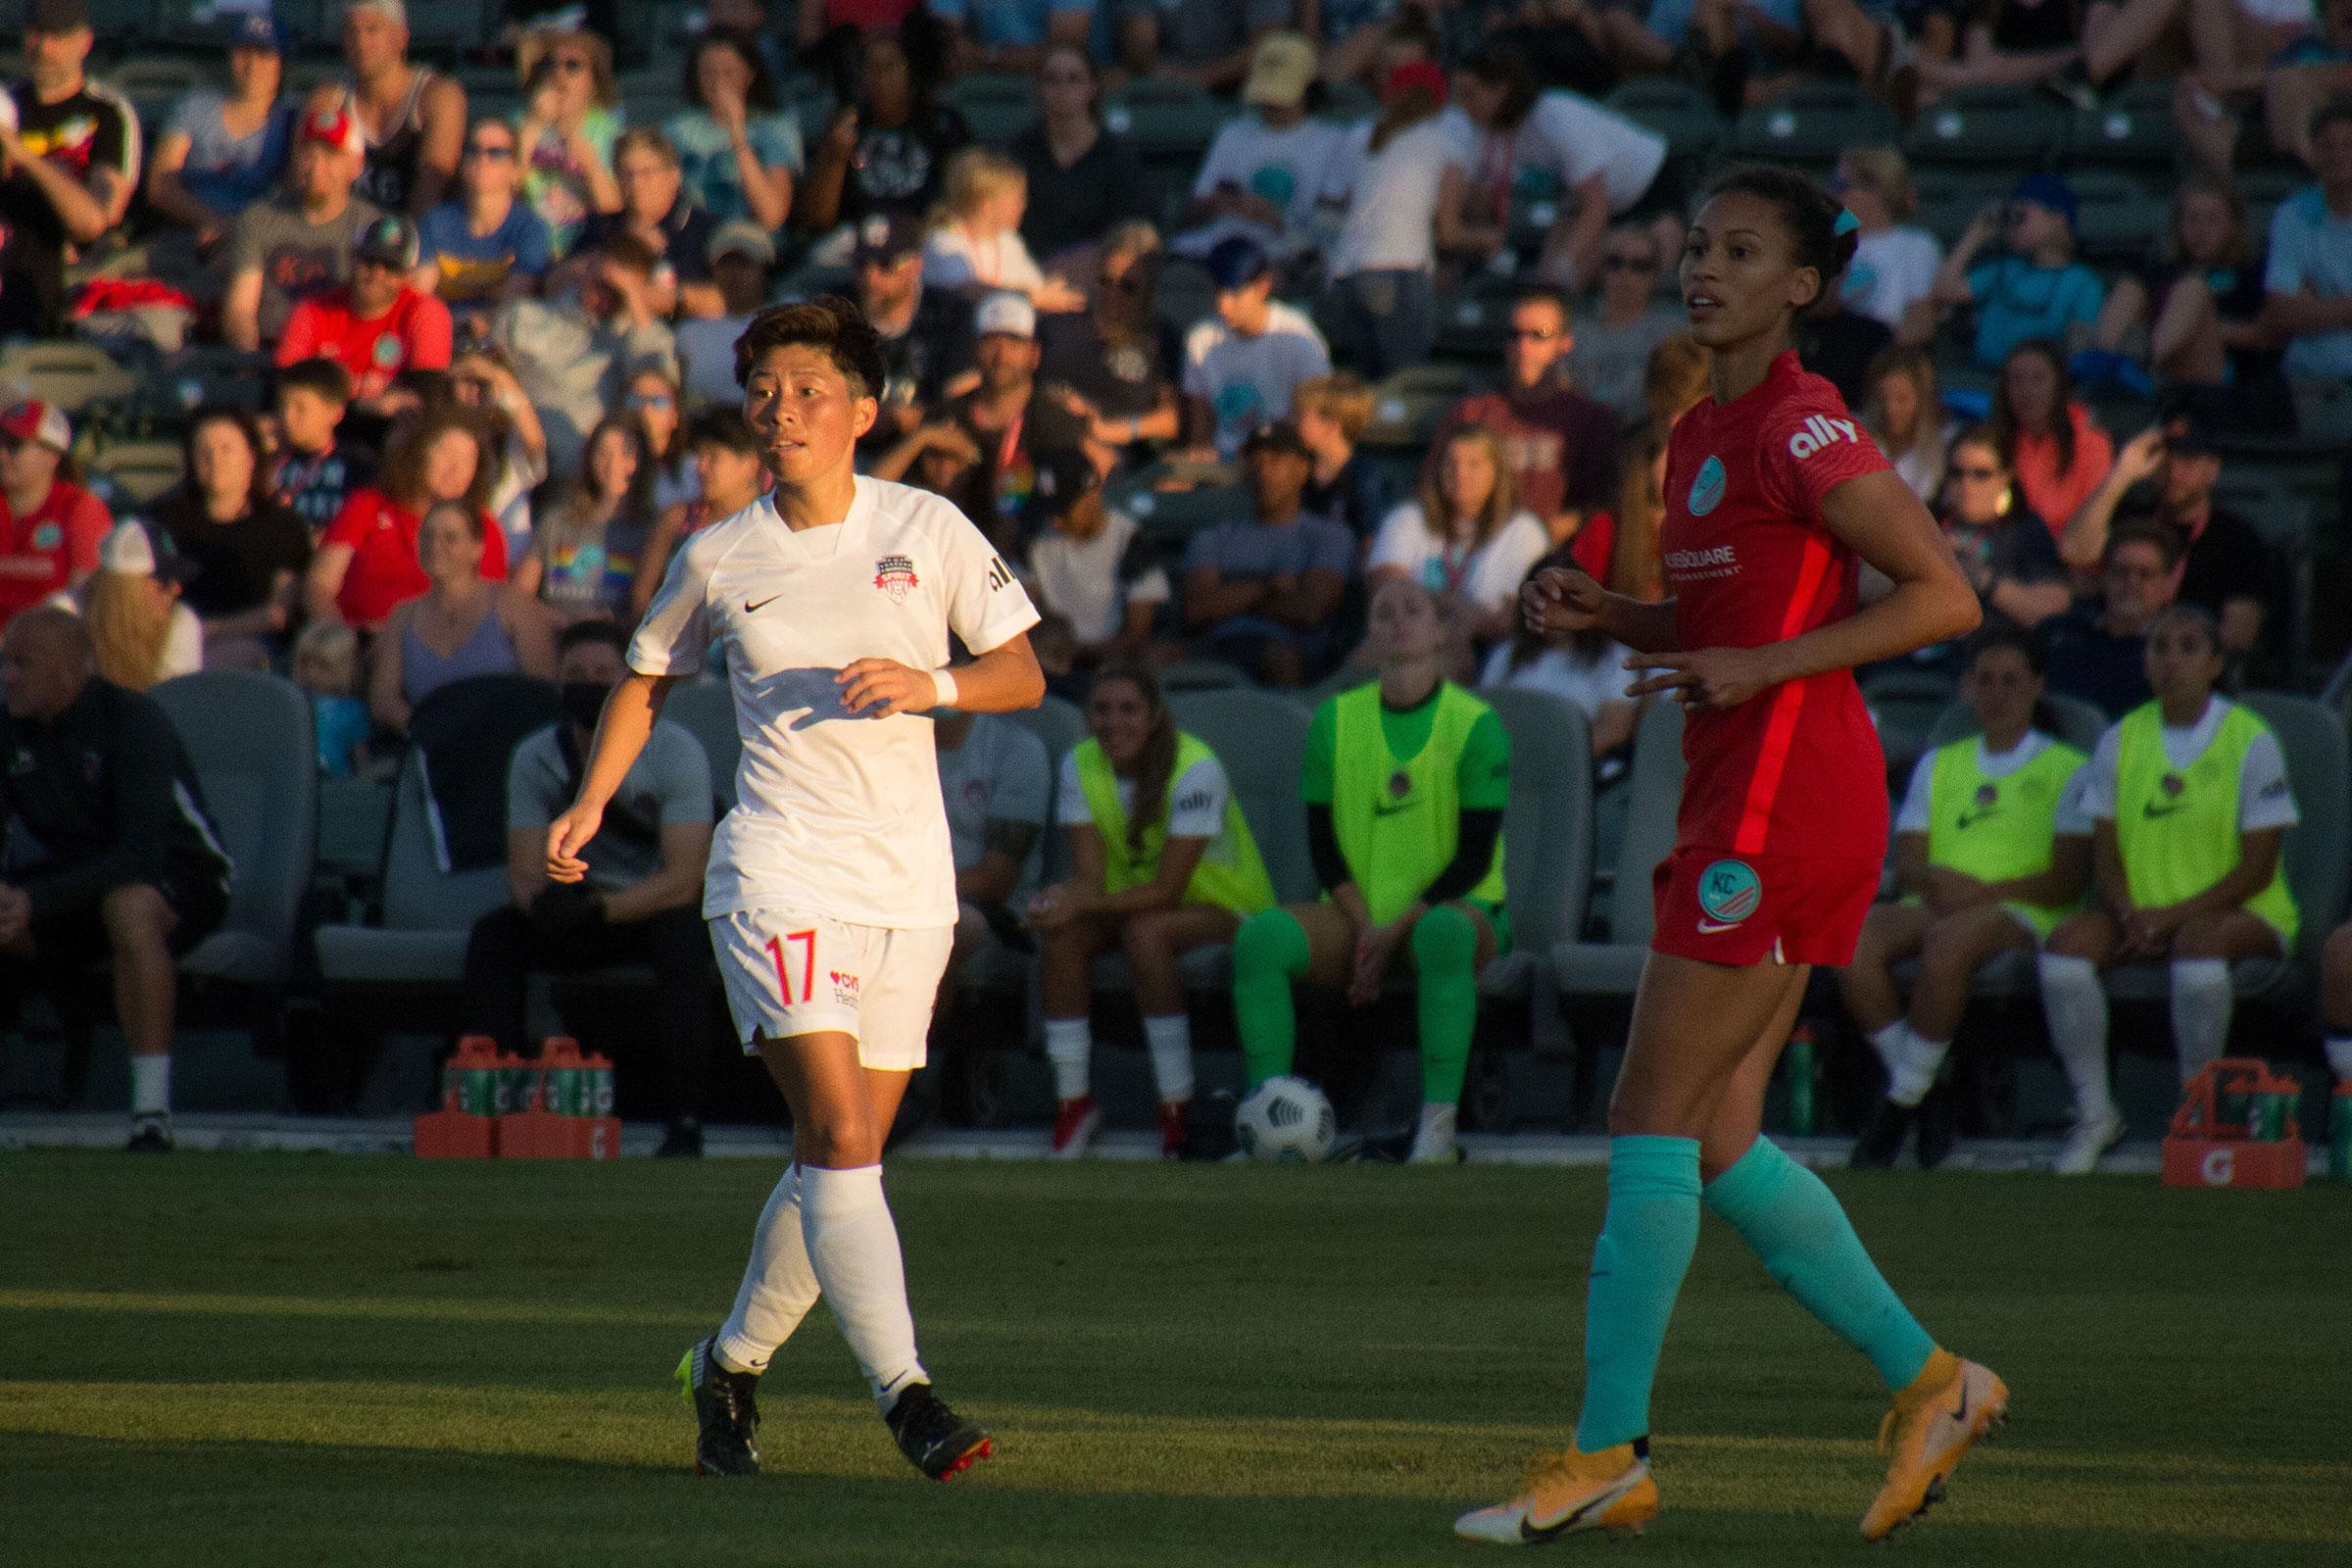 Kumi Yokoyama, left, during the National Women's Soccer League game between Kansas City NWSL and Washington Spirit at Legends Field in Kansas City, Kansas on June 26, 2021.